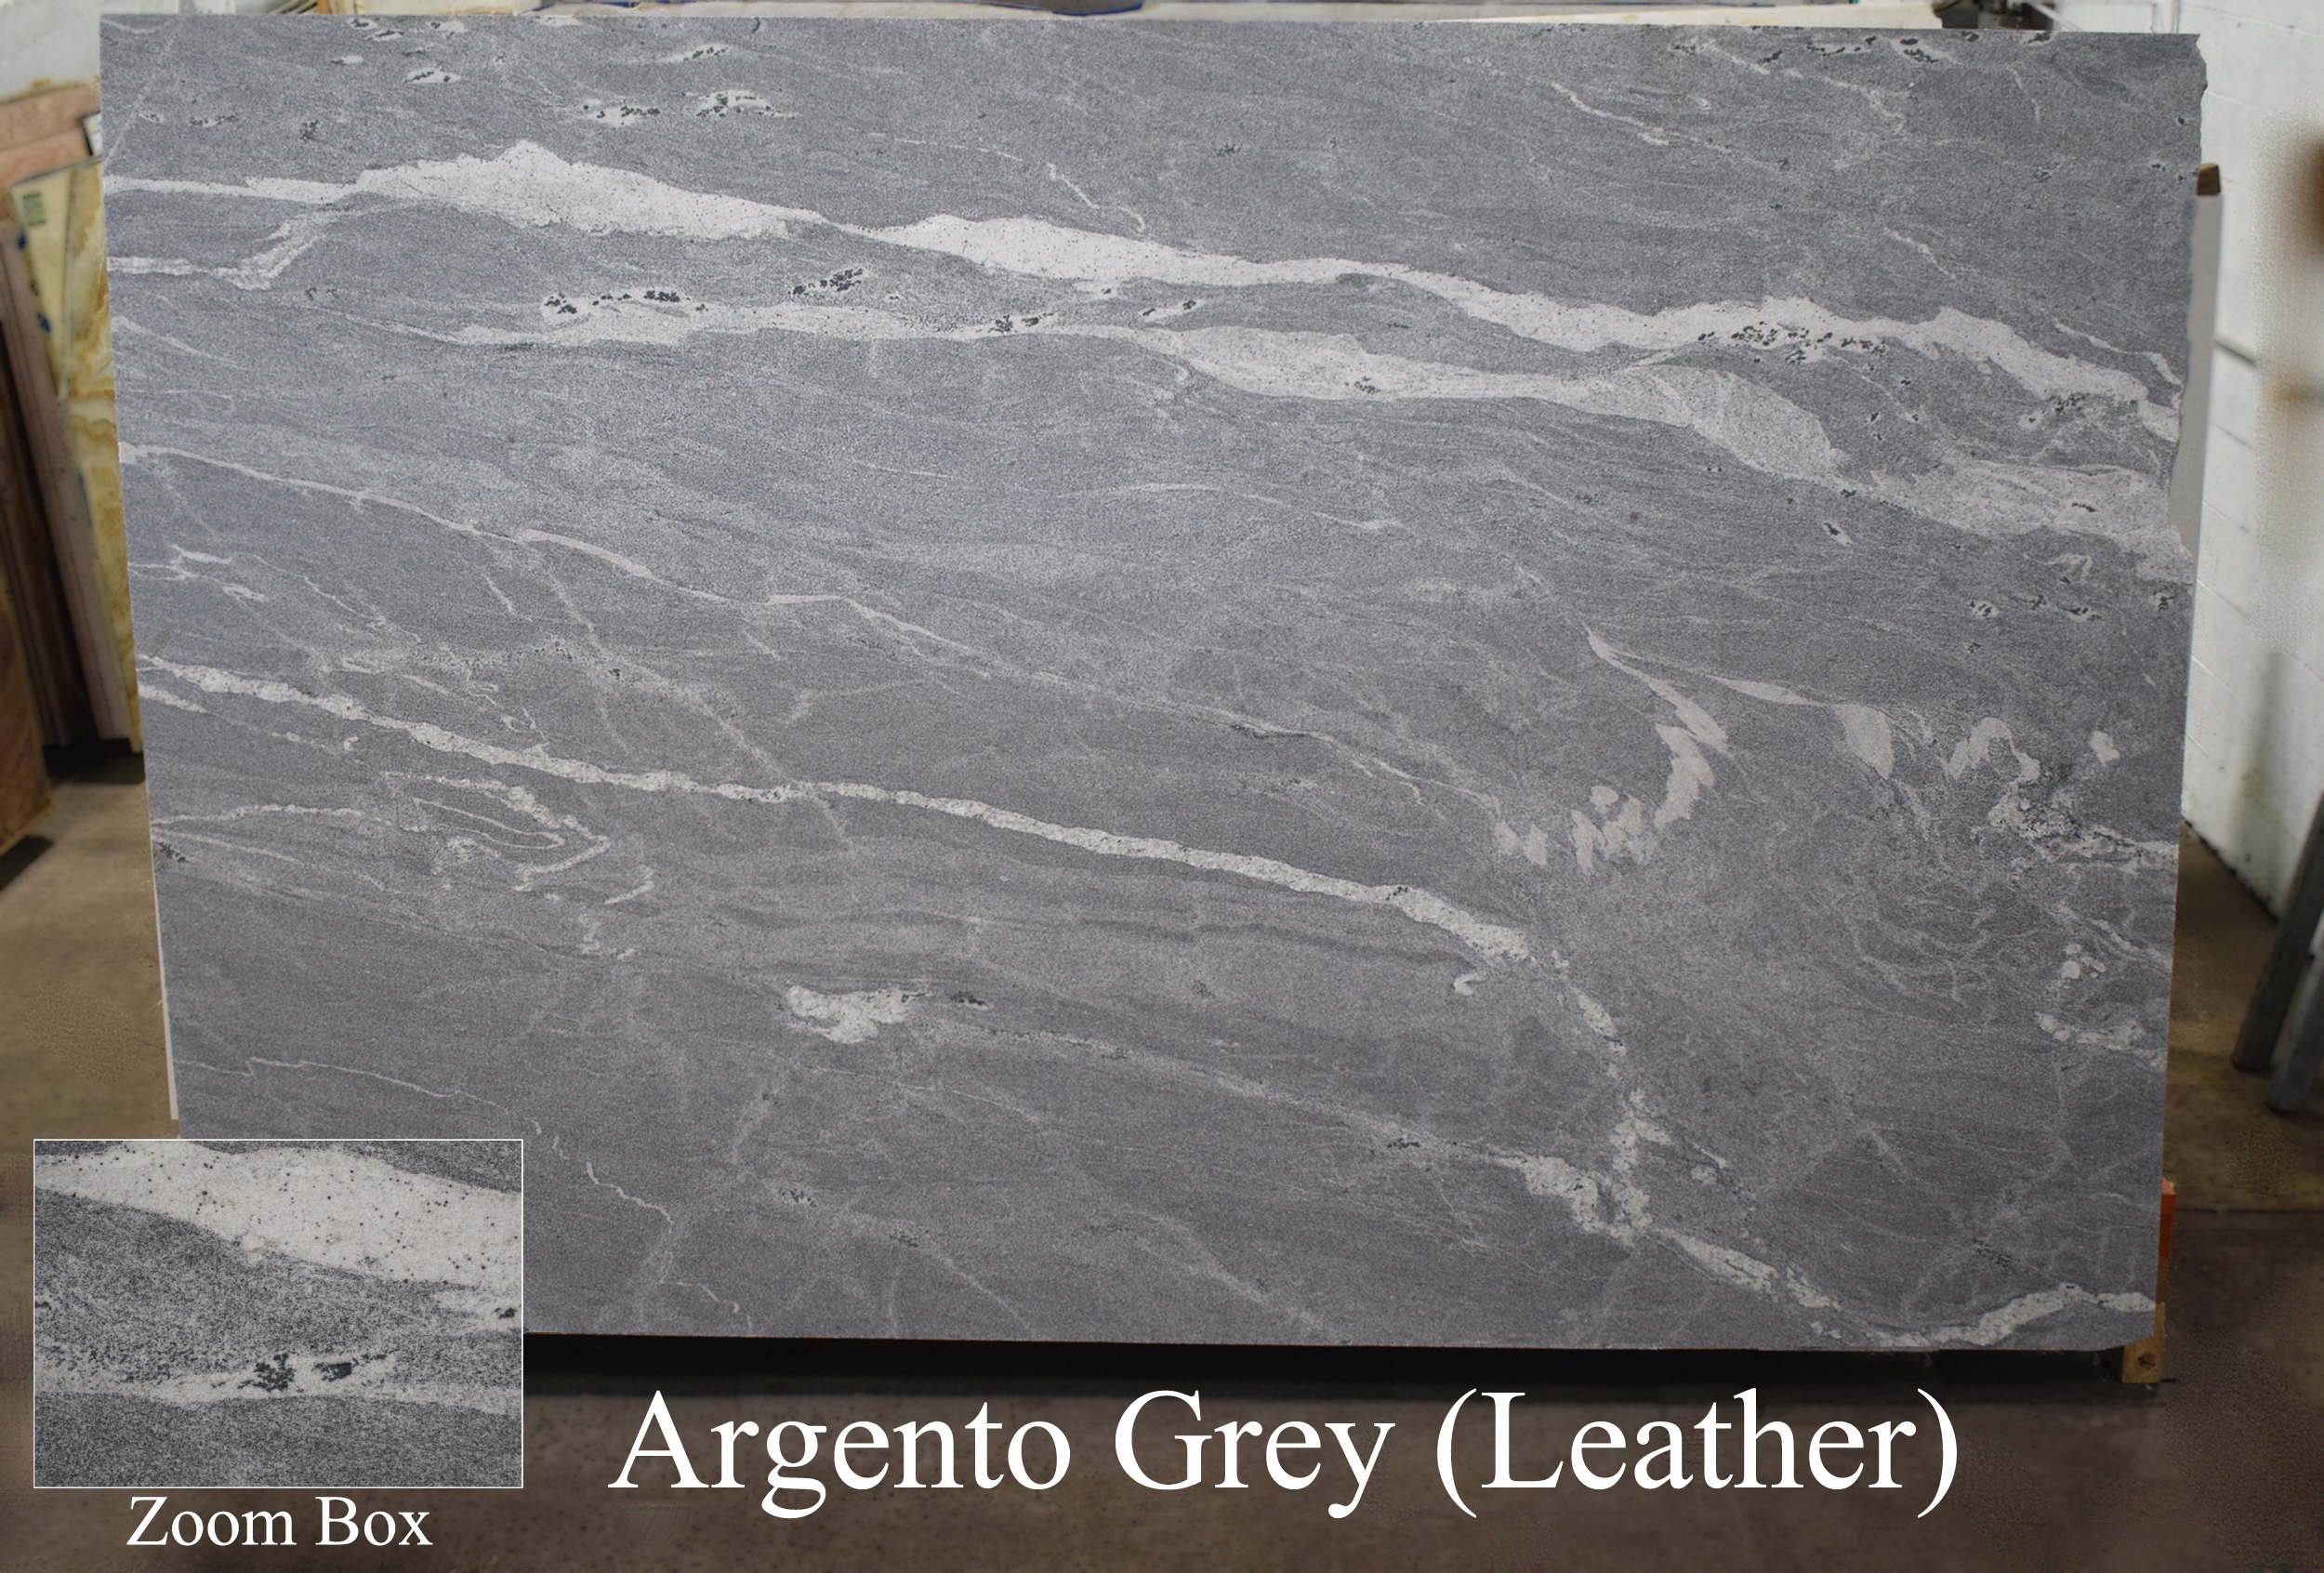 ARGENTO GREY (LEATHER)